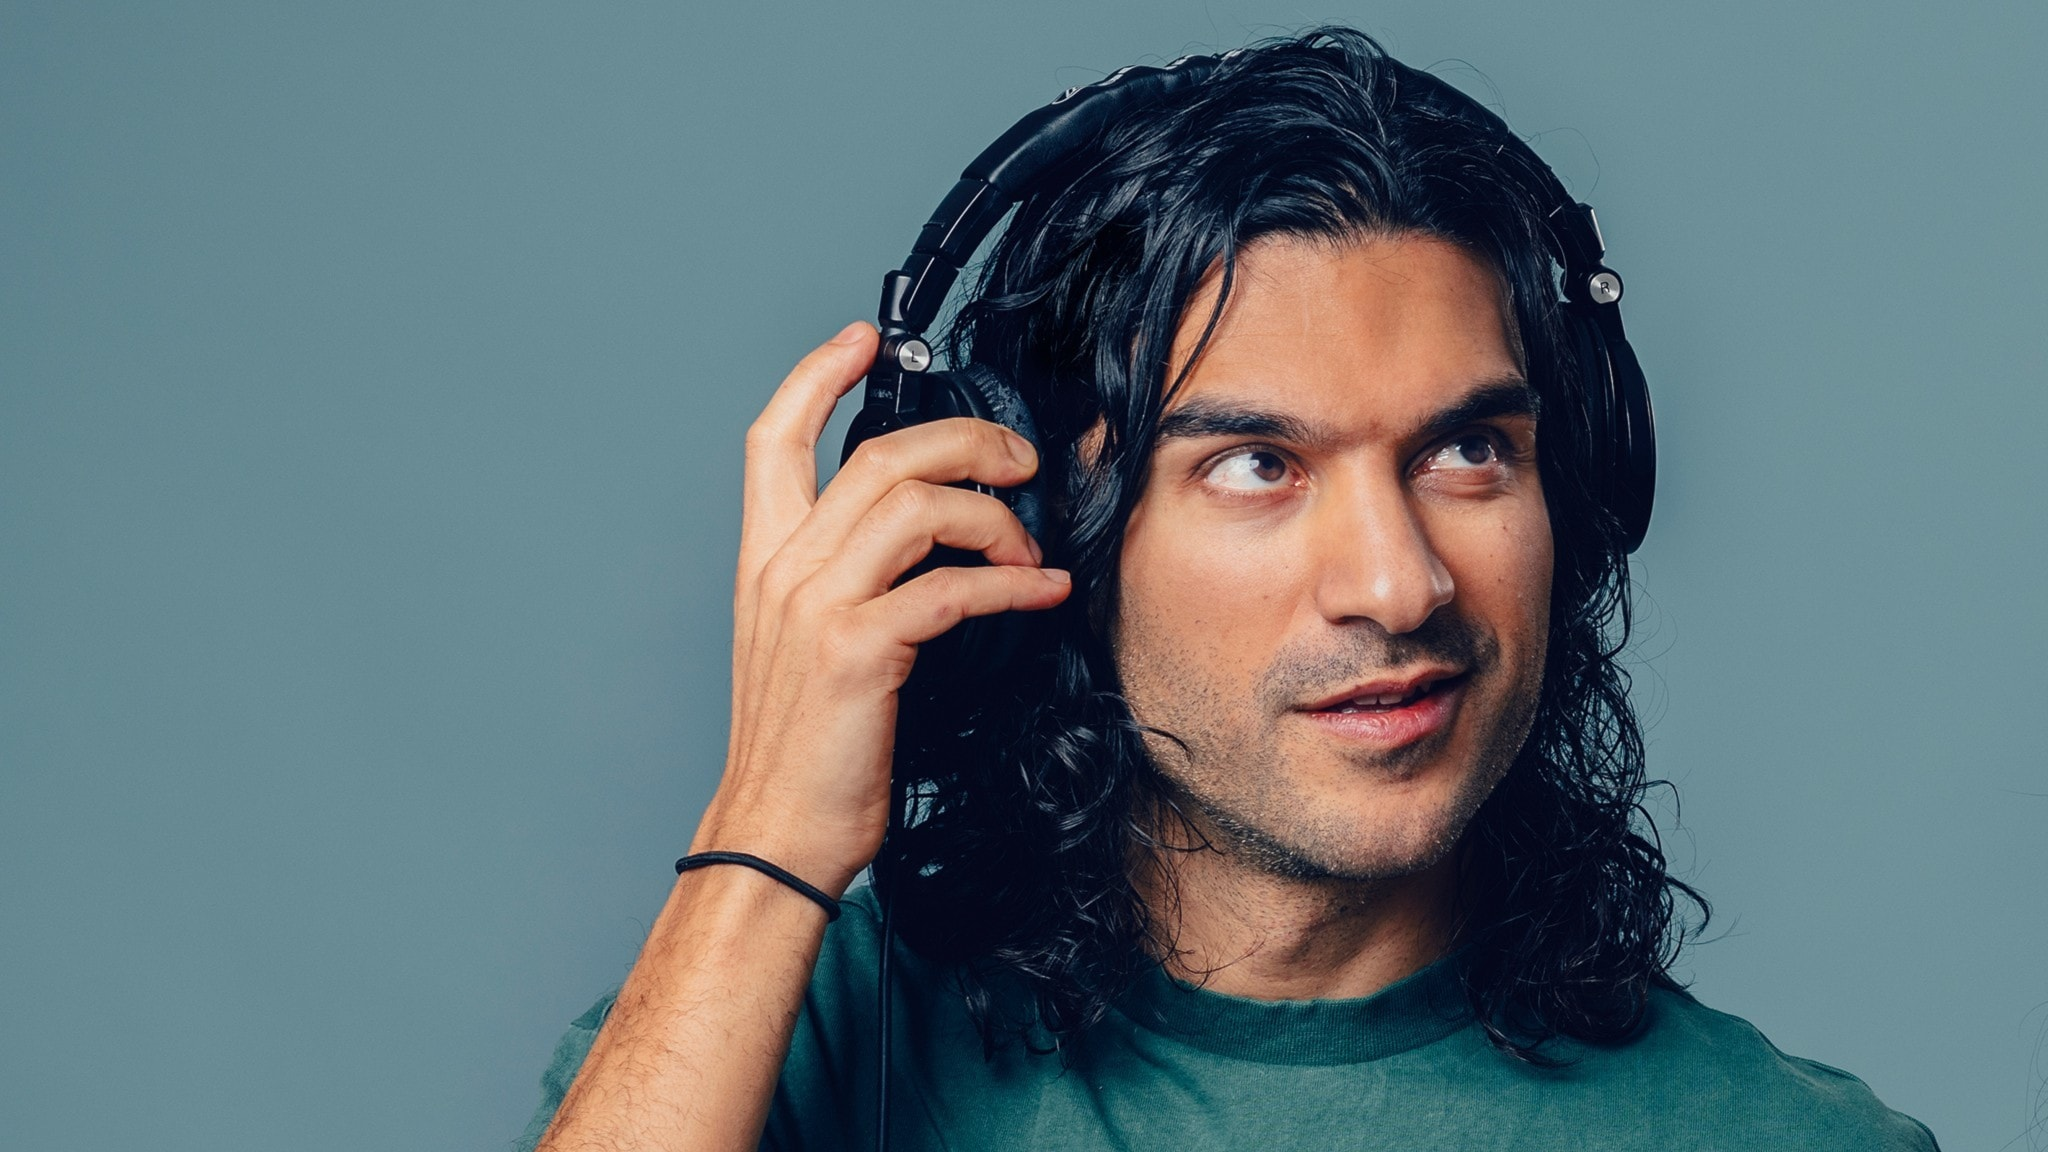 Farzad Farzaneh i Barnmorgon lyssnar i sina hörlurar. Foto: Alexander Donka